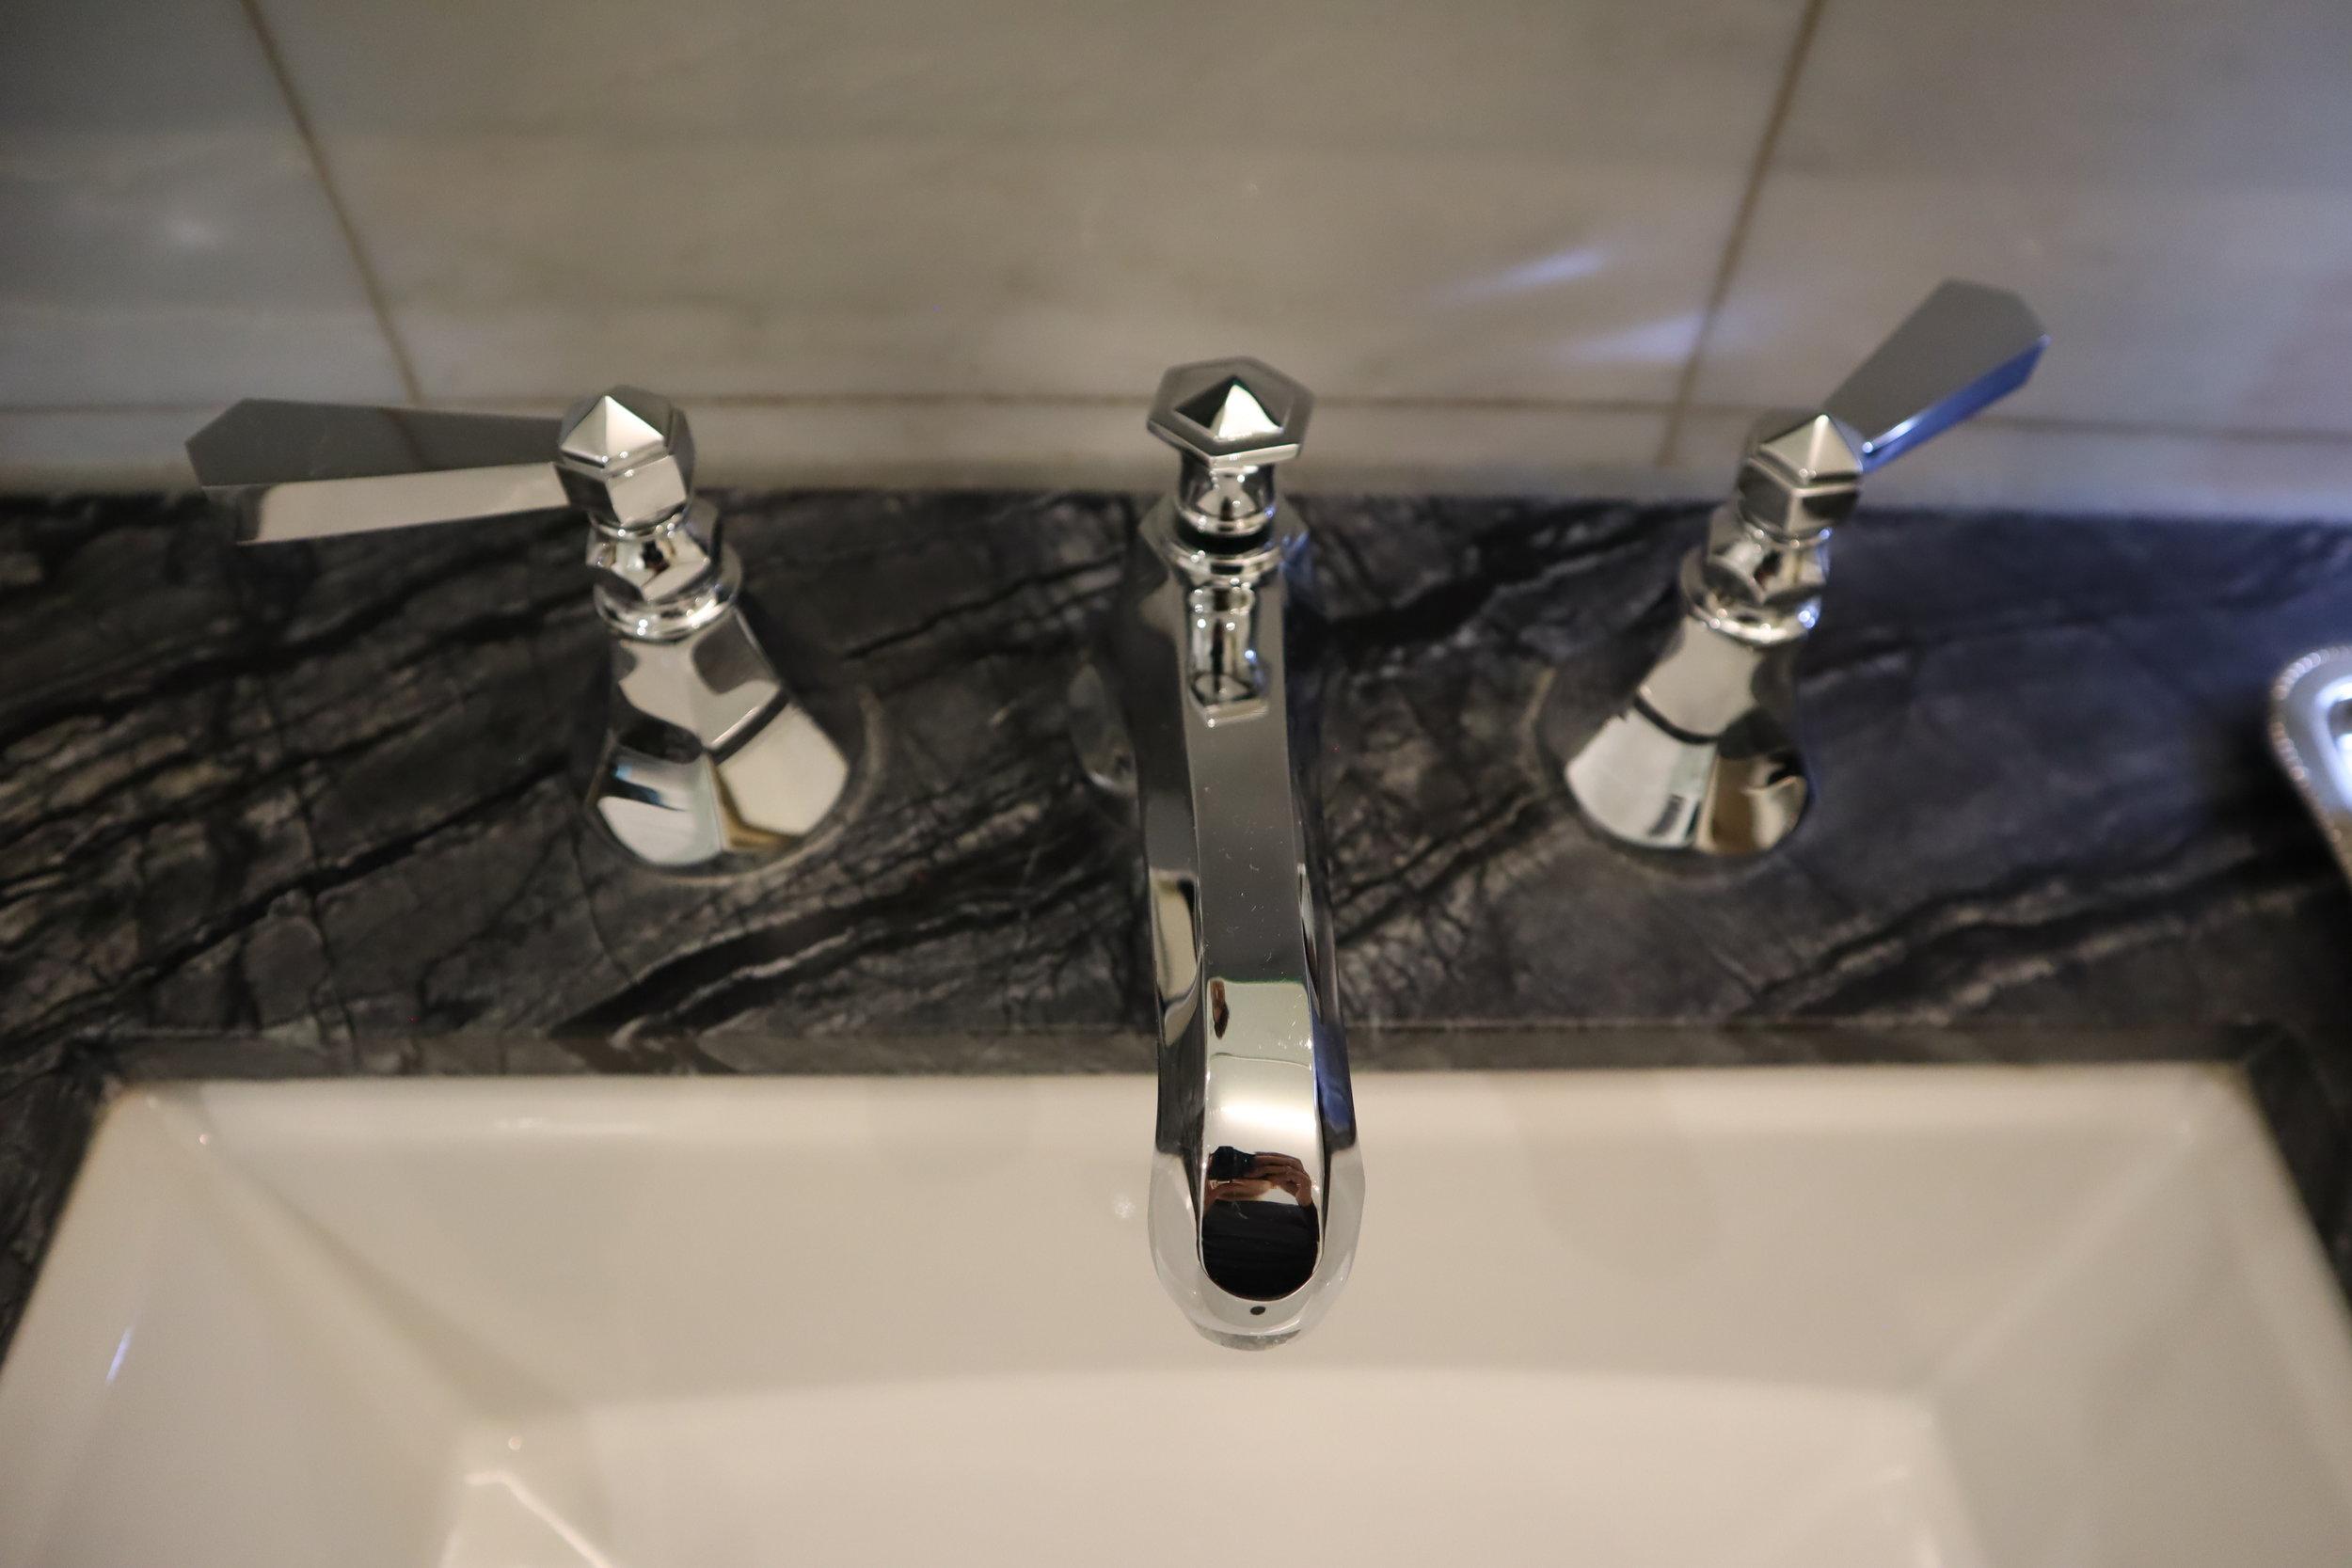 St. Regis Toronto – Wonky tap